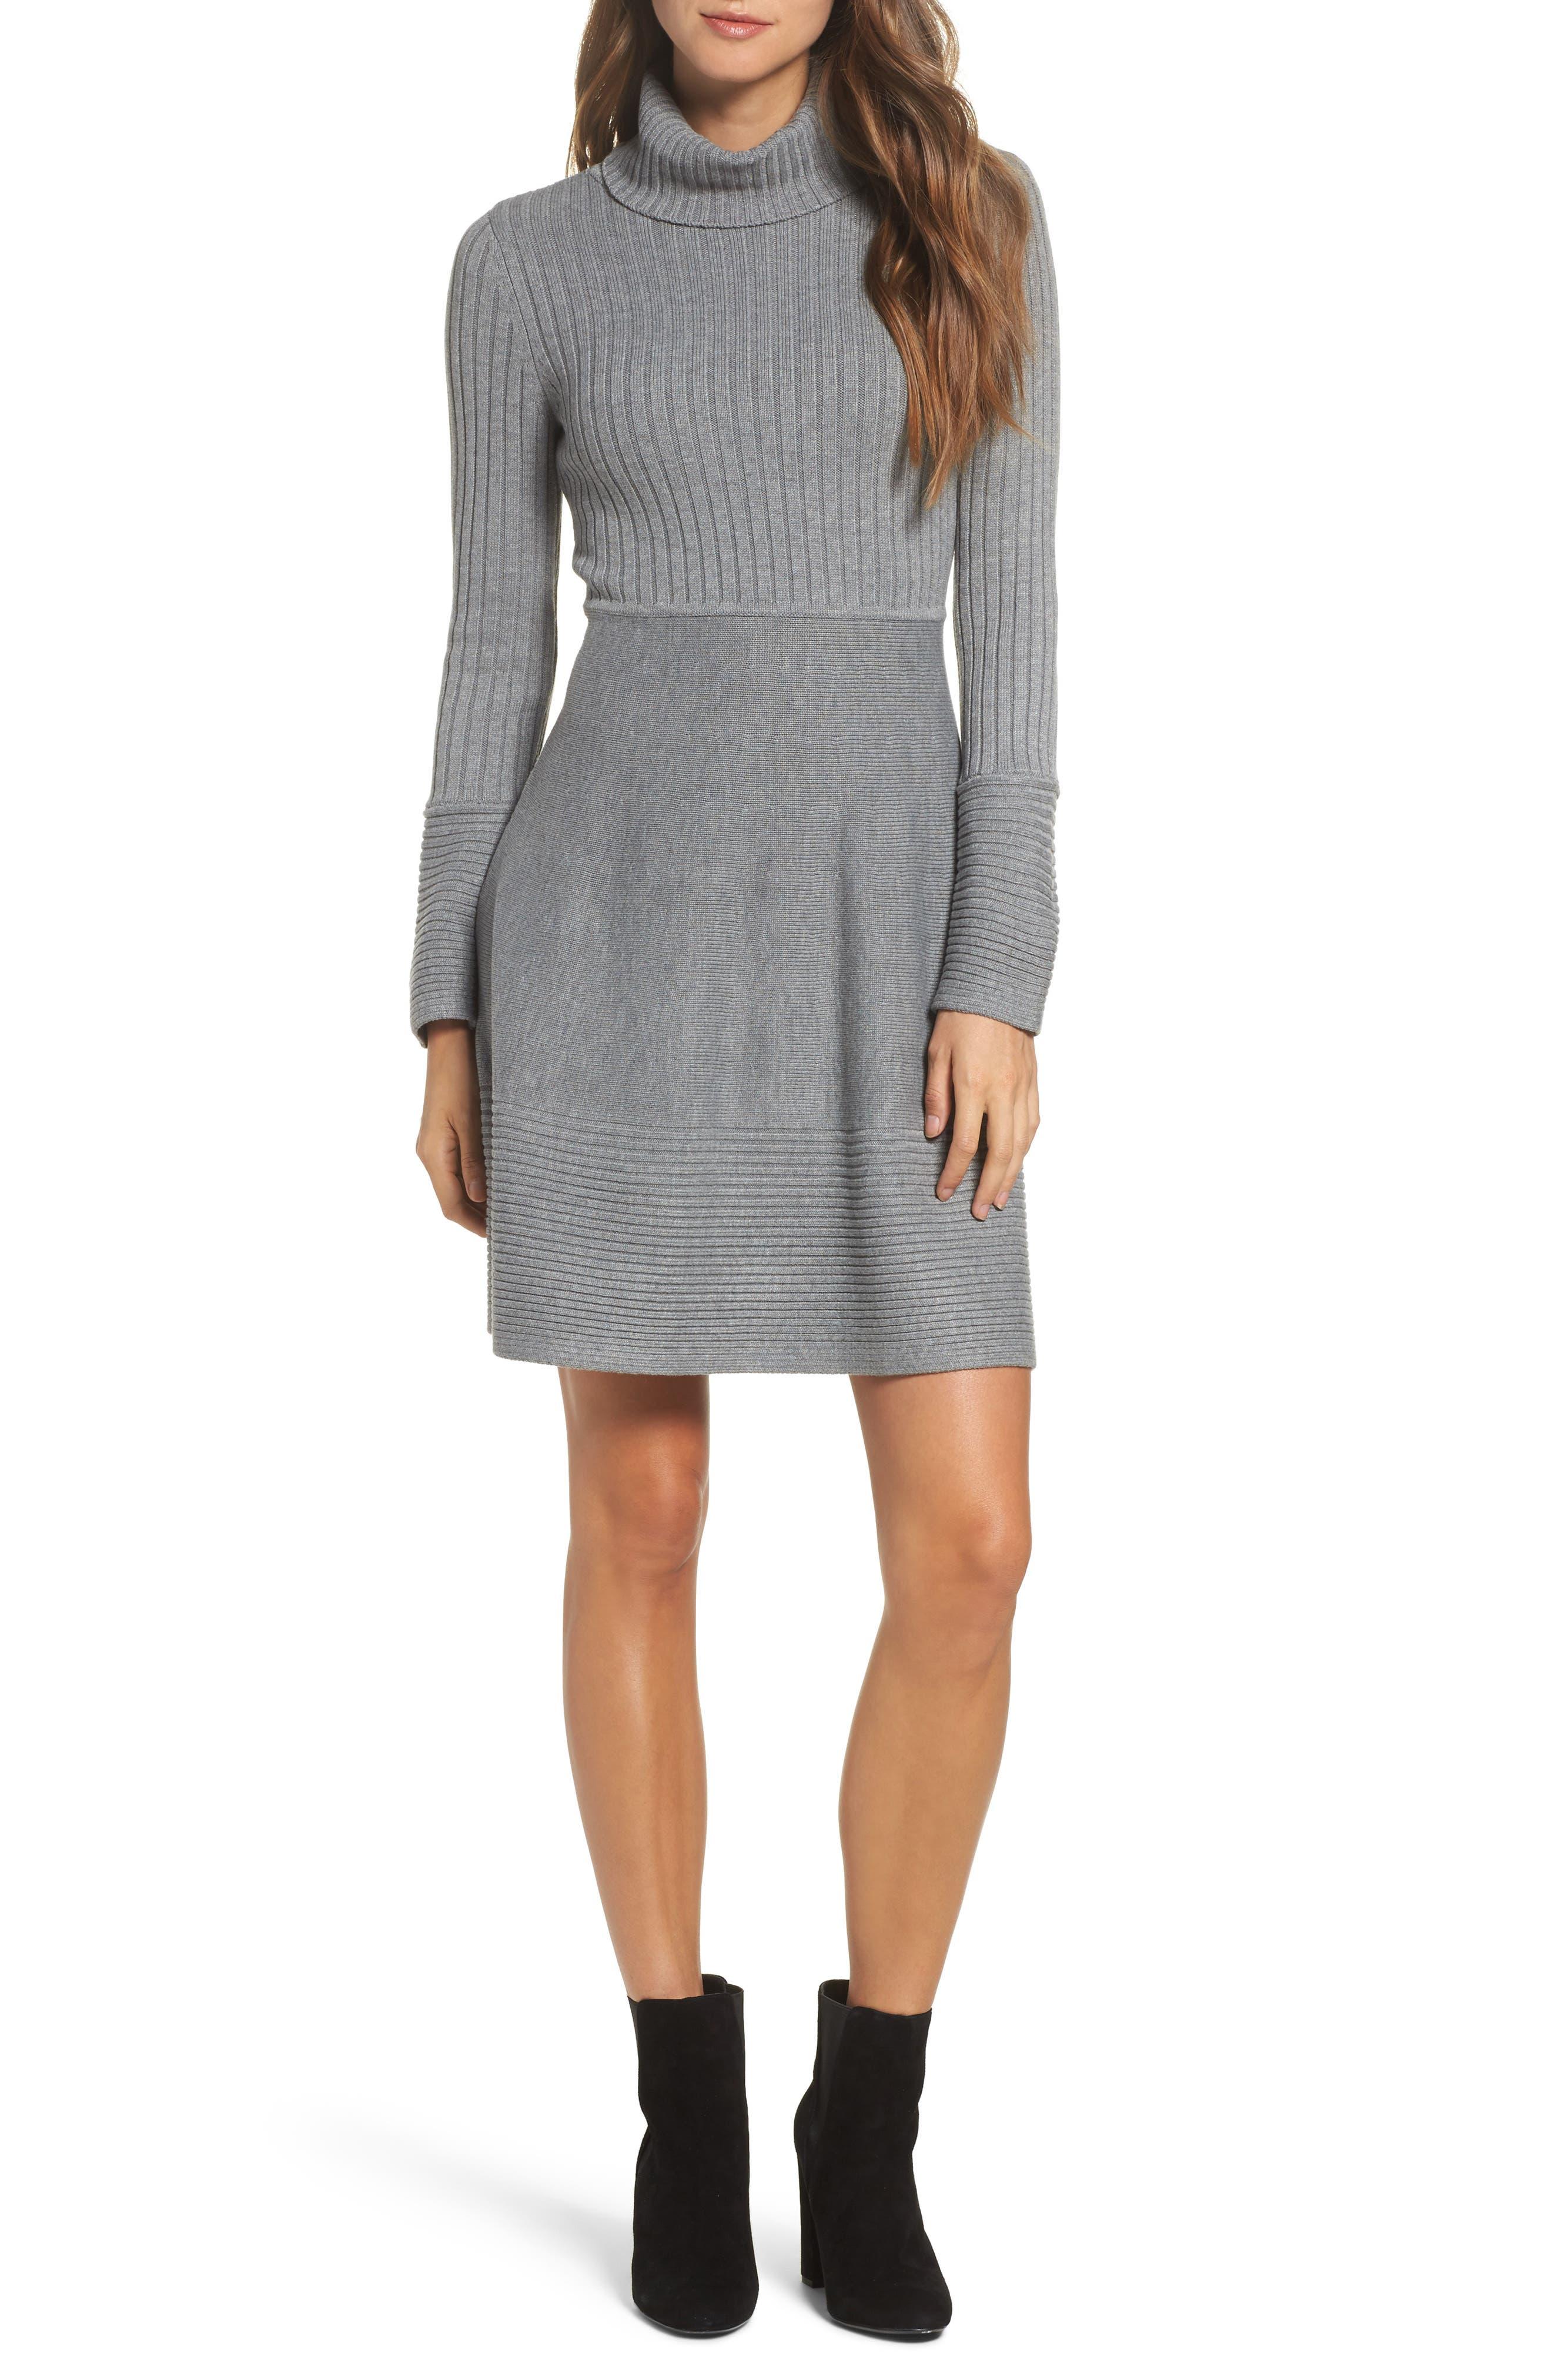 ELIZA J Turtleneck Sweater Dress, Main, color, GREY